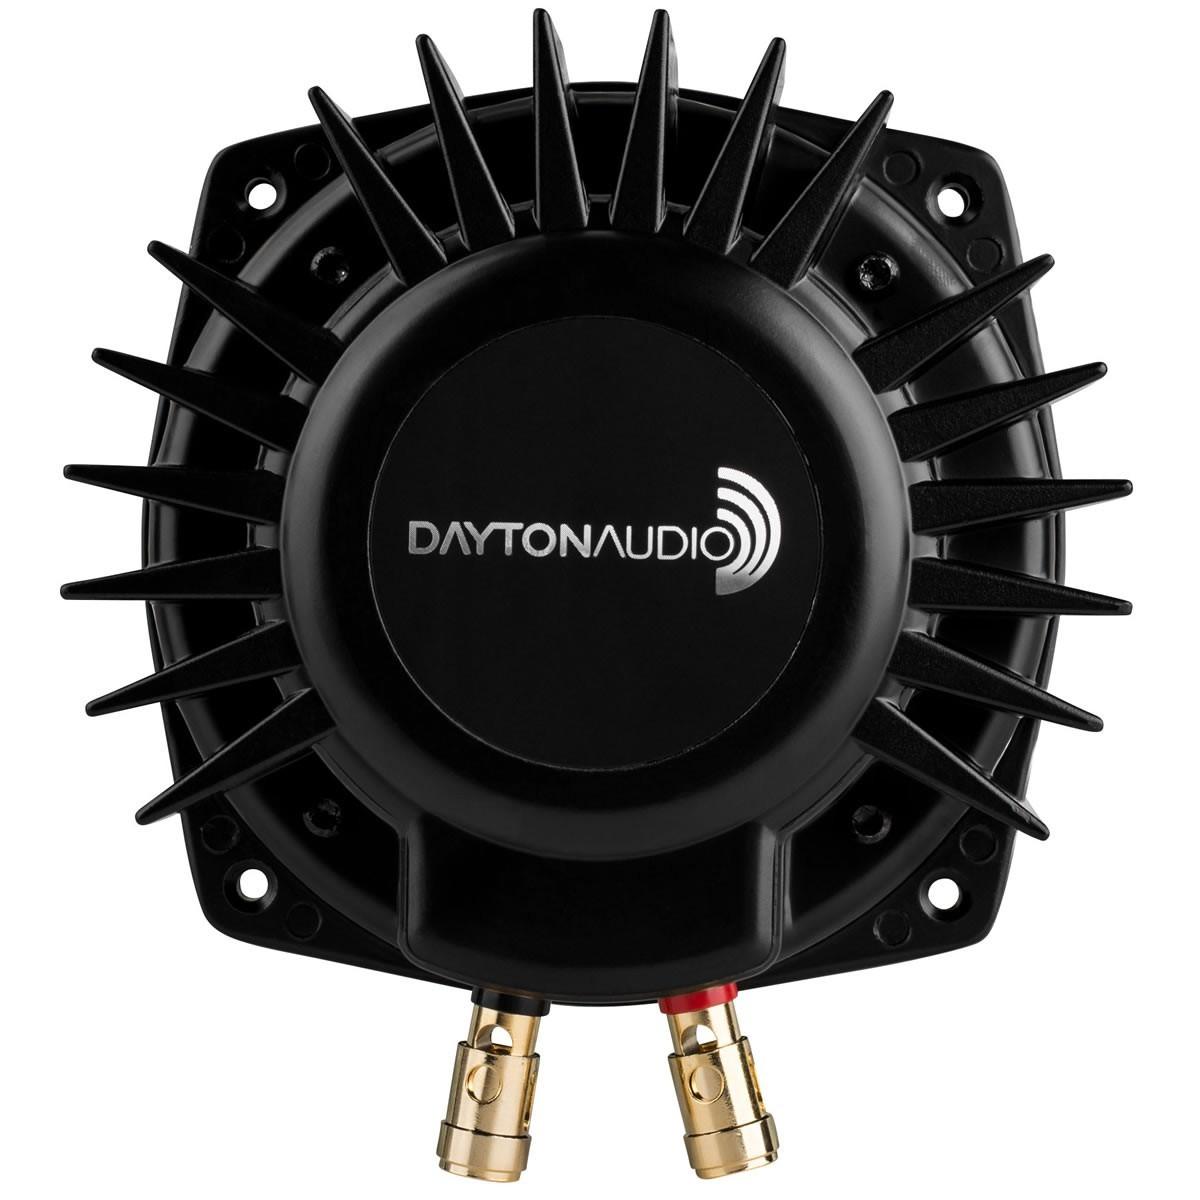 DAYTON AUDIO BST-1 Bass Shaker Vibreur 50W 4 Ohm